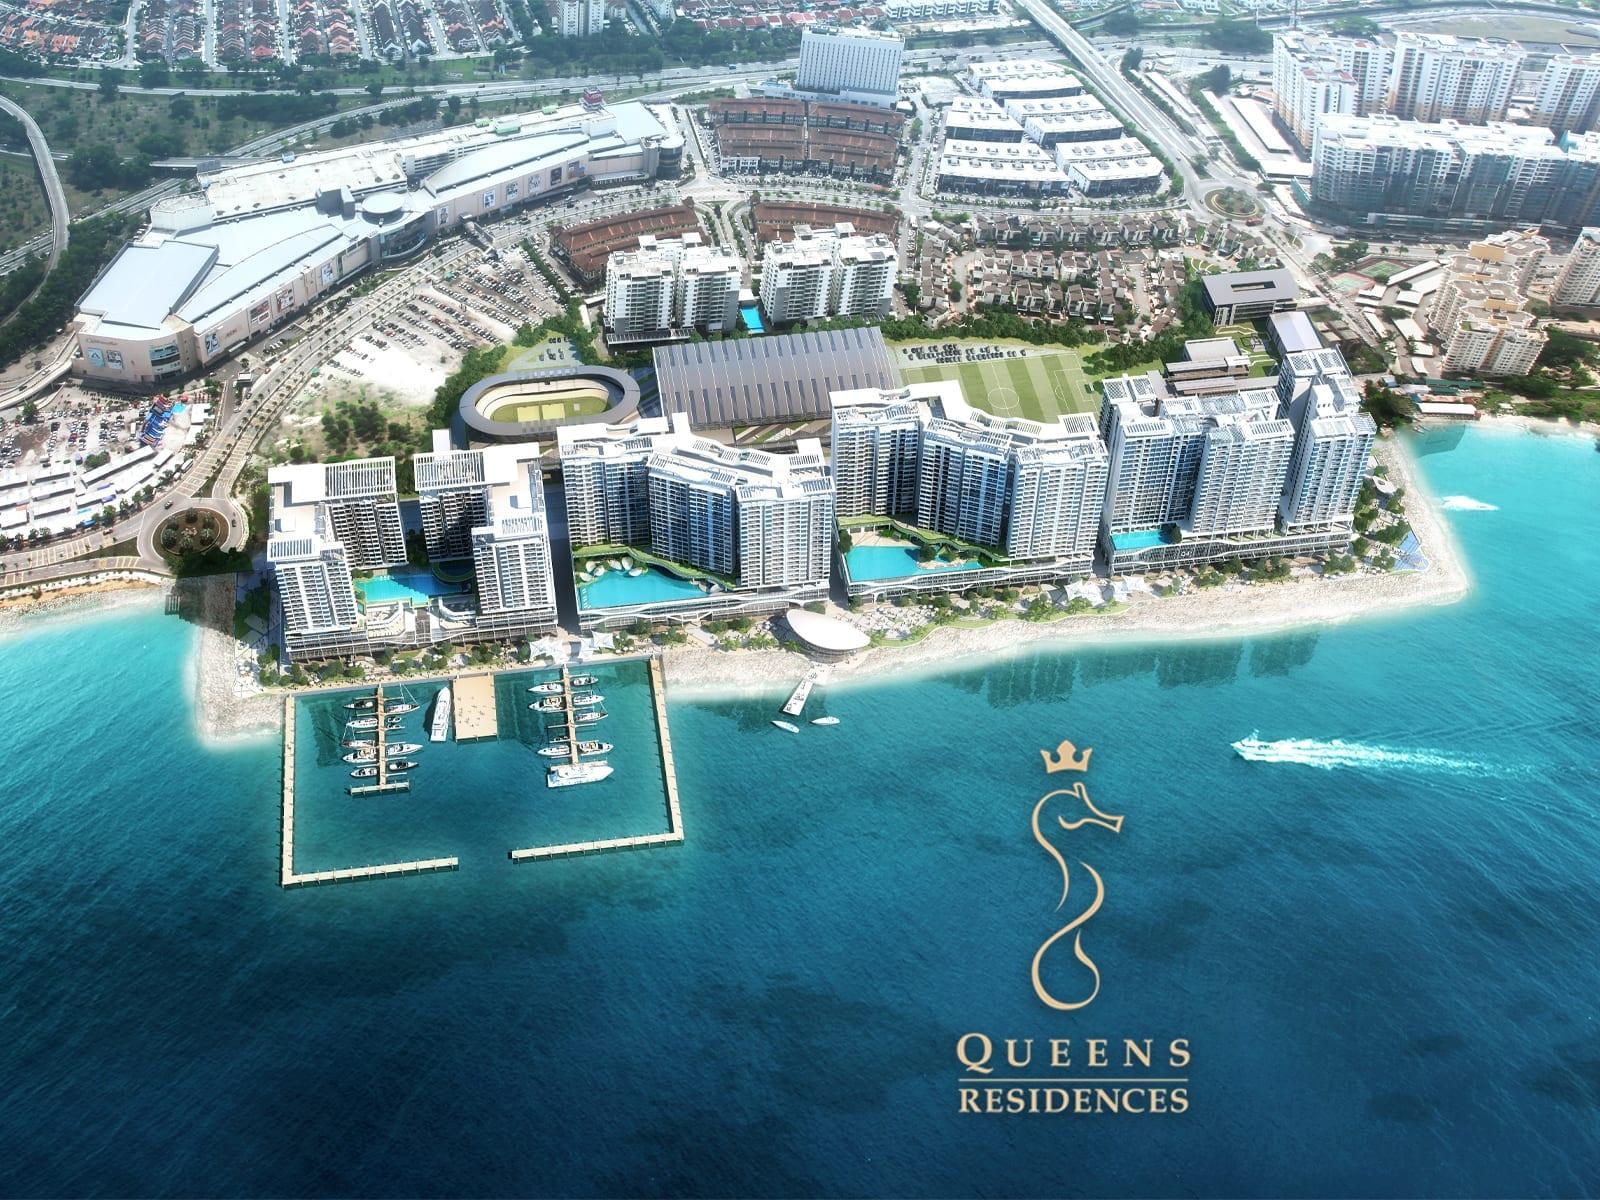 Queens Residences